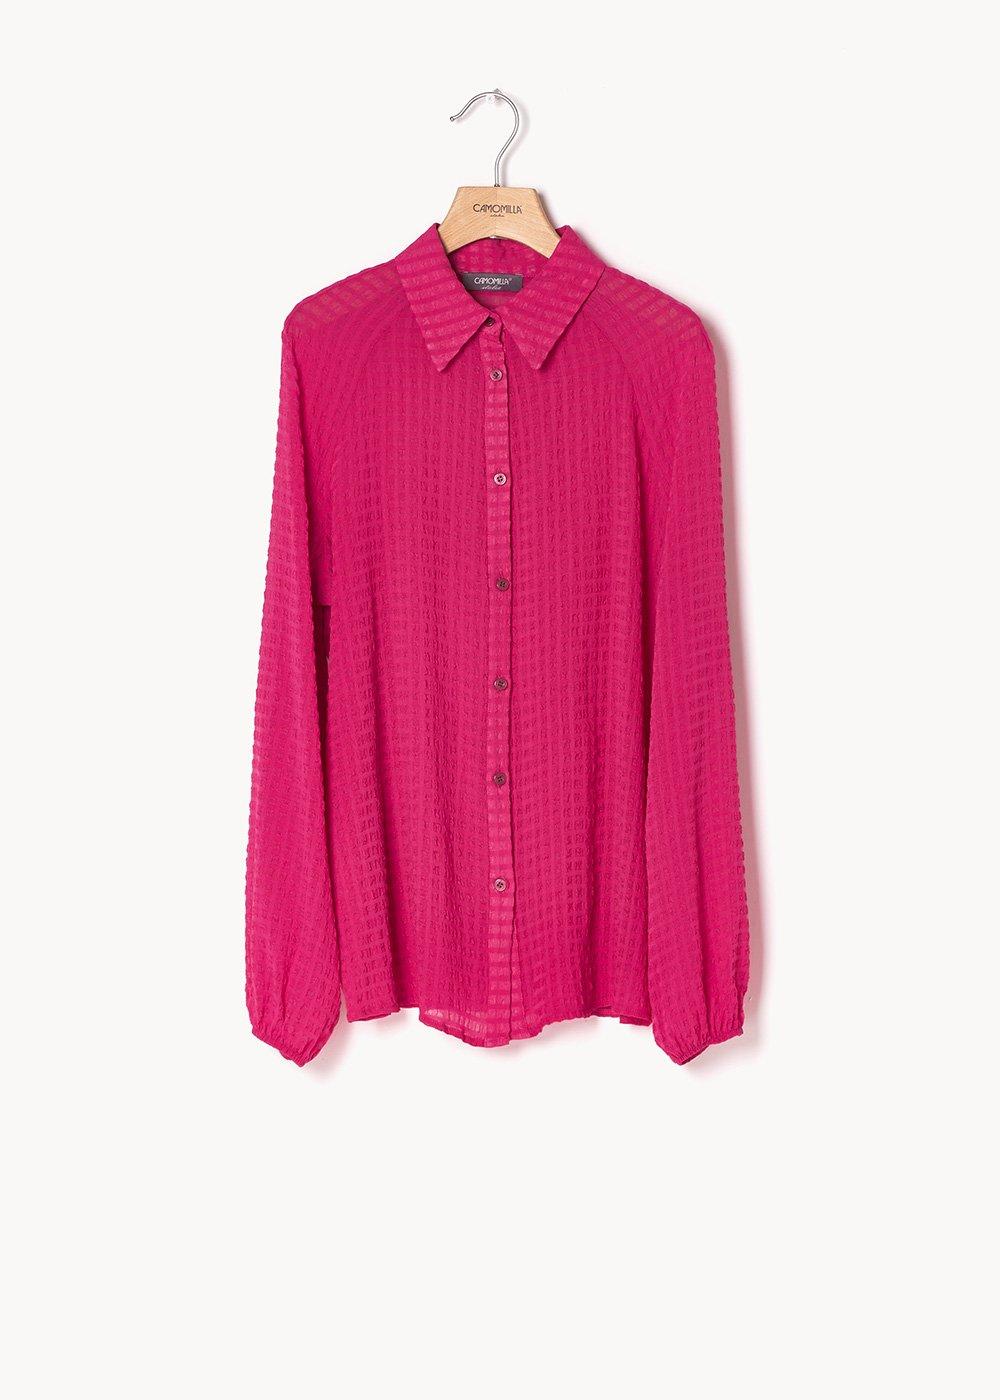 Carol shirt in seersucker - effect fabric - Gloss - Woman